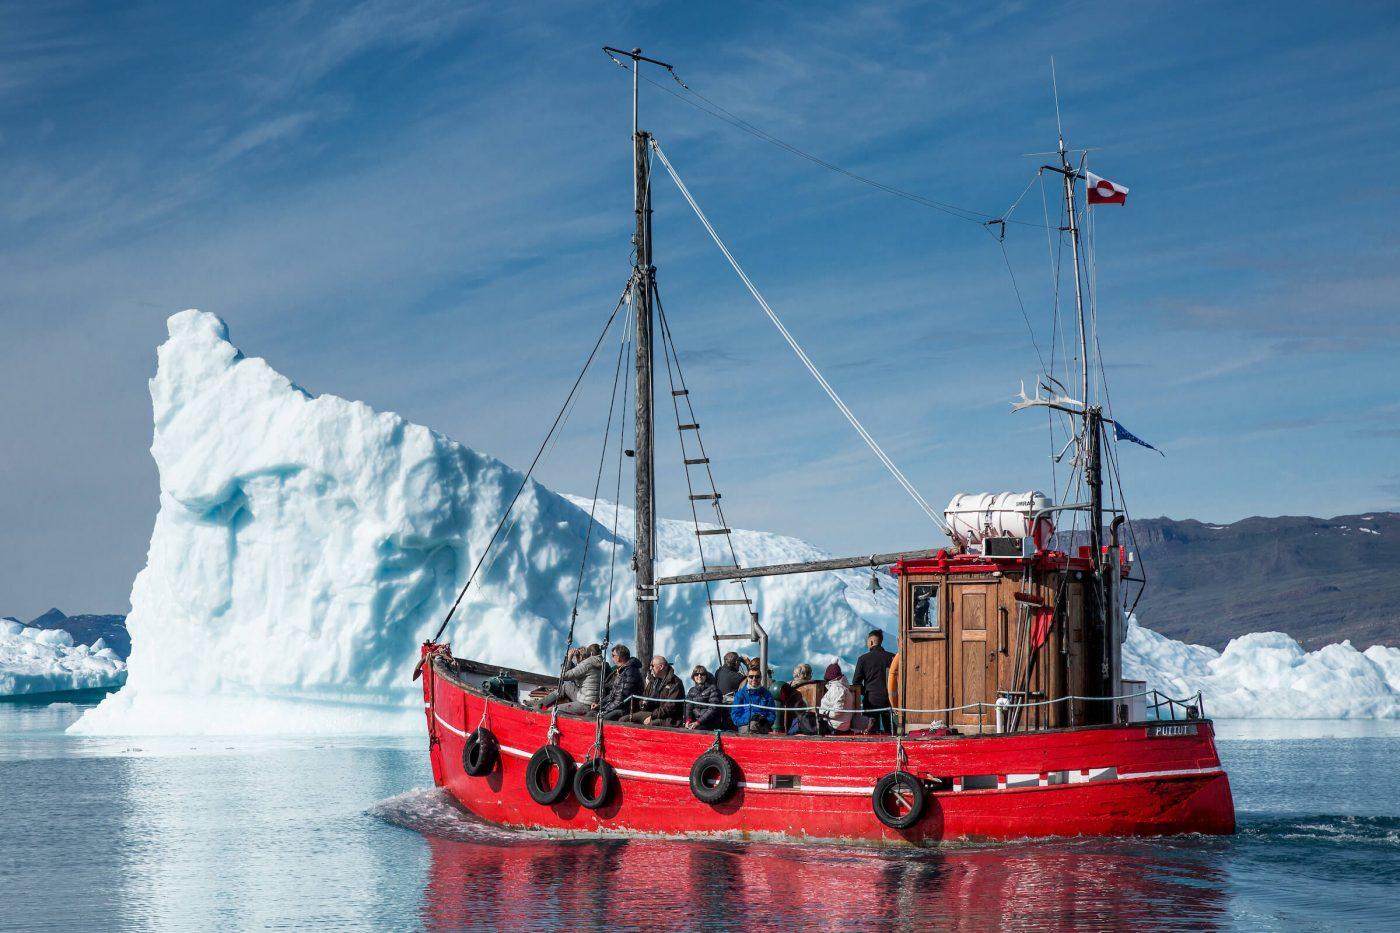 Blue Ice boat Puttut among icebergs near Qooroq ice fjord in Narsarsuaq 05. Photo by Mads Pihl.